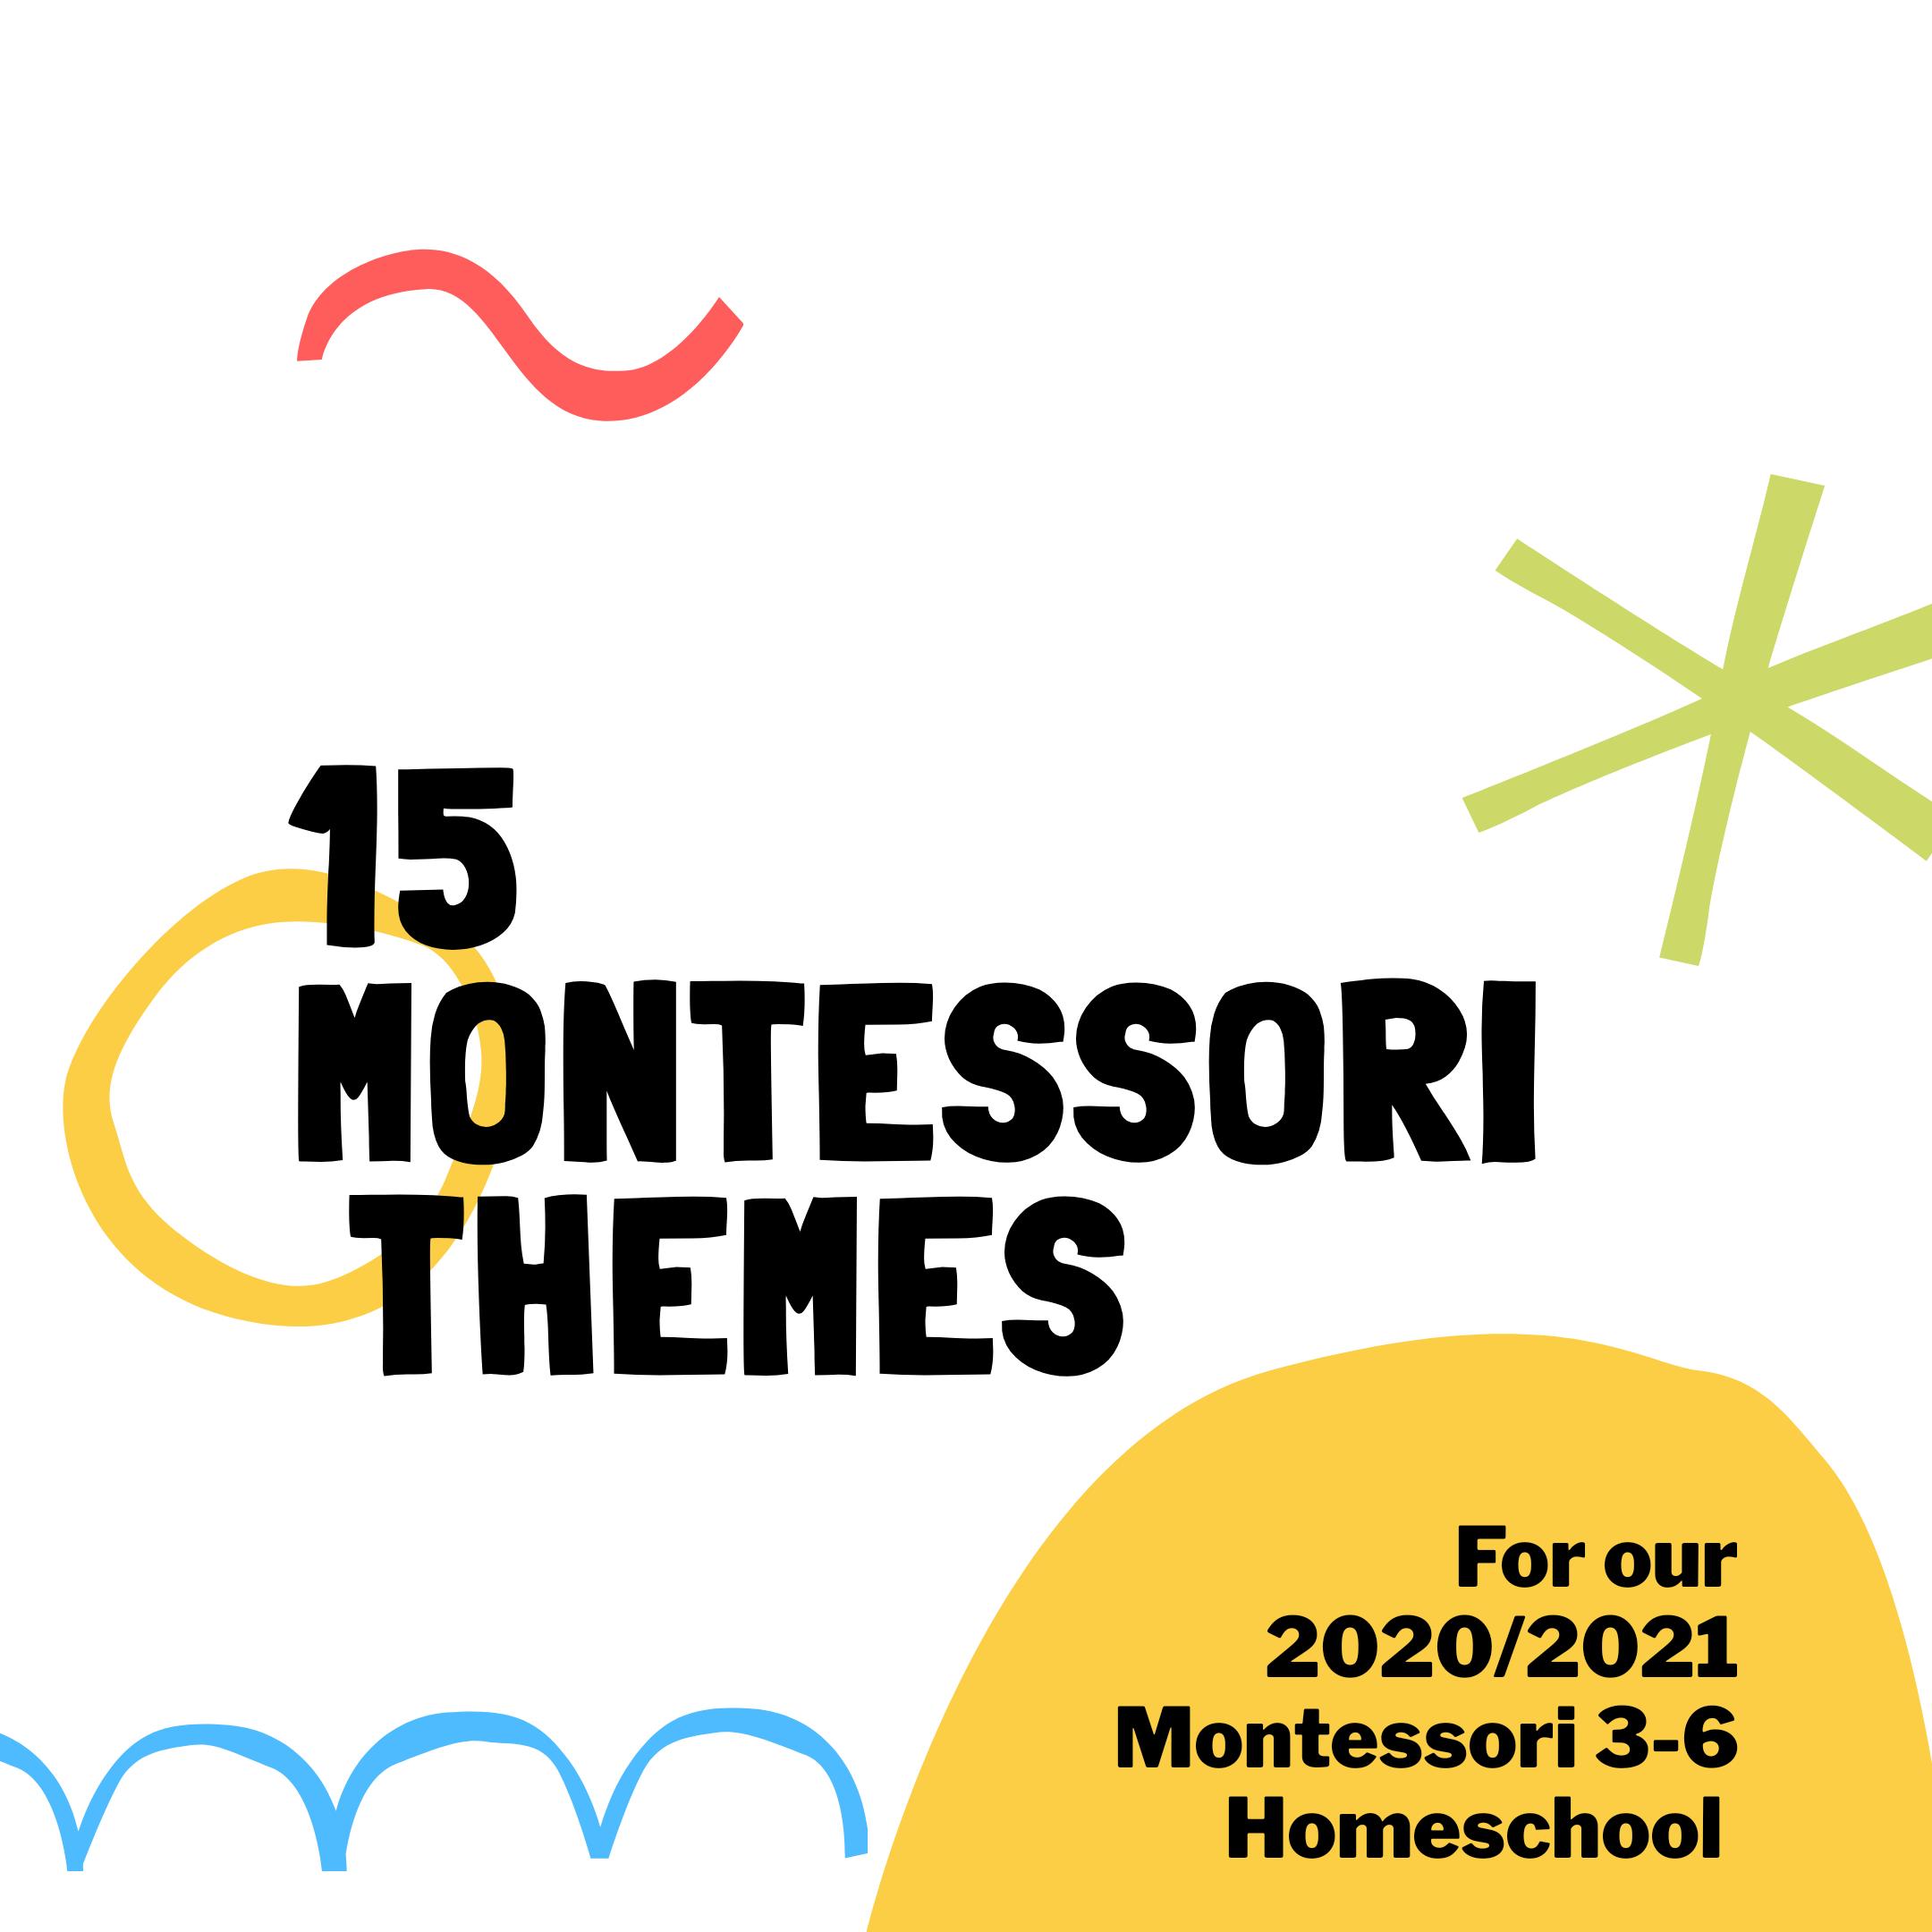 2020/2021 Themes for our 3-6 Montessori Homeschool